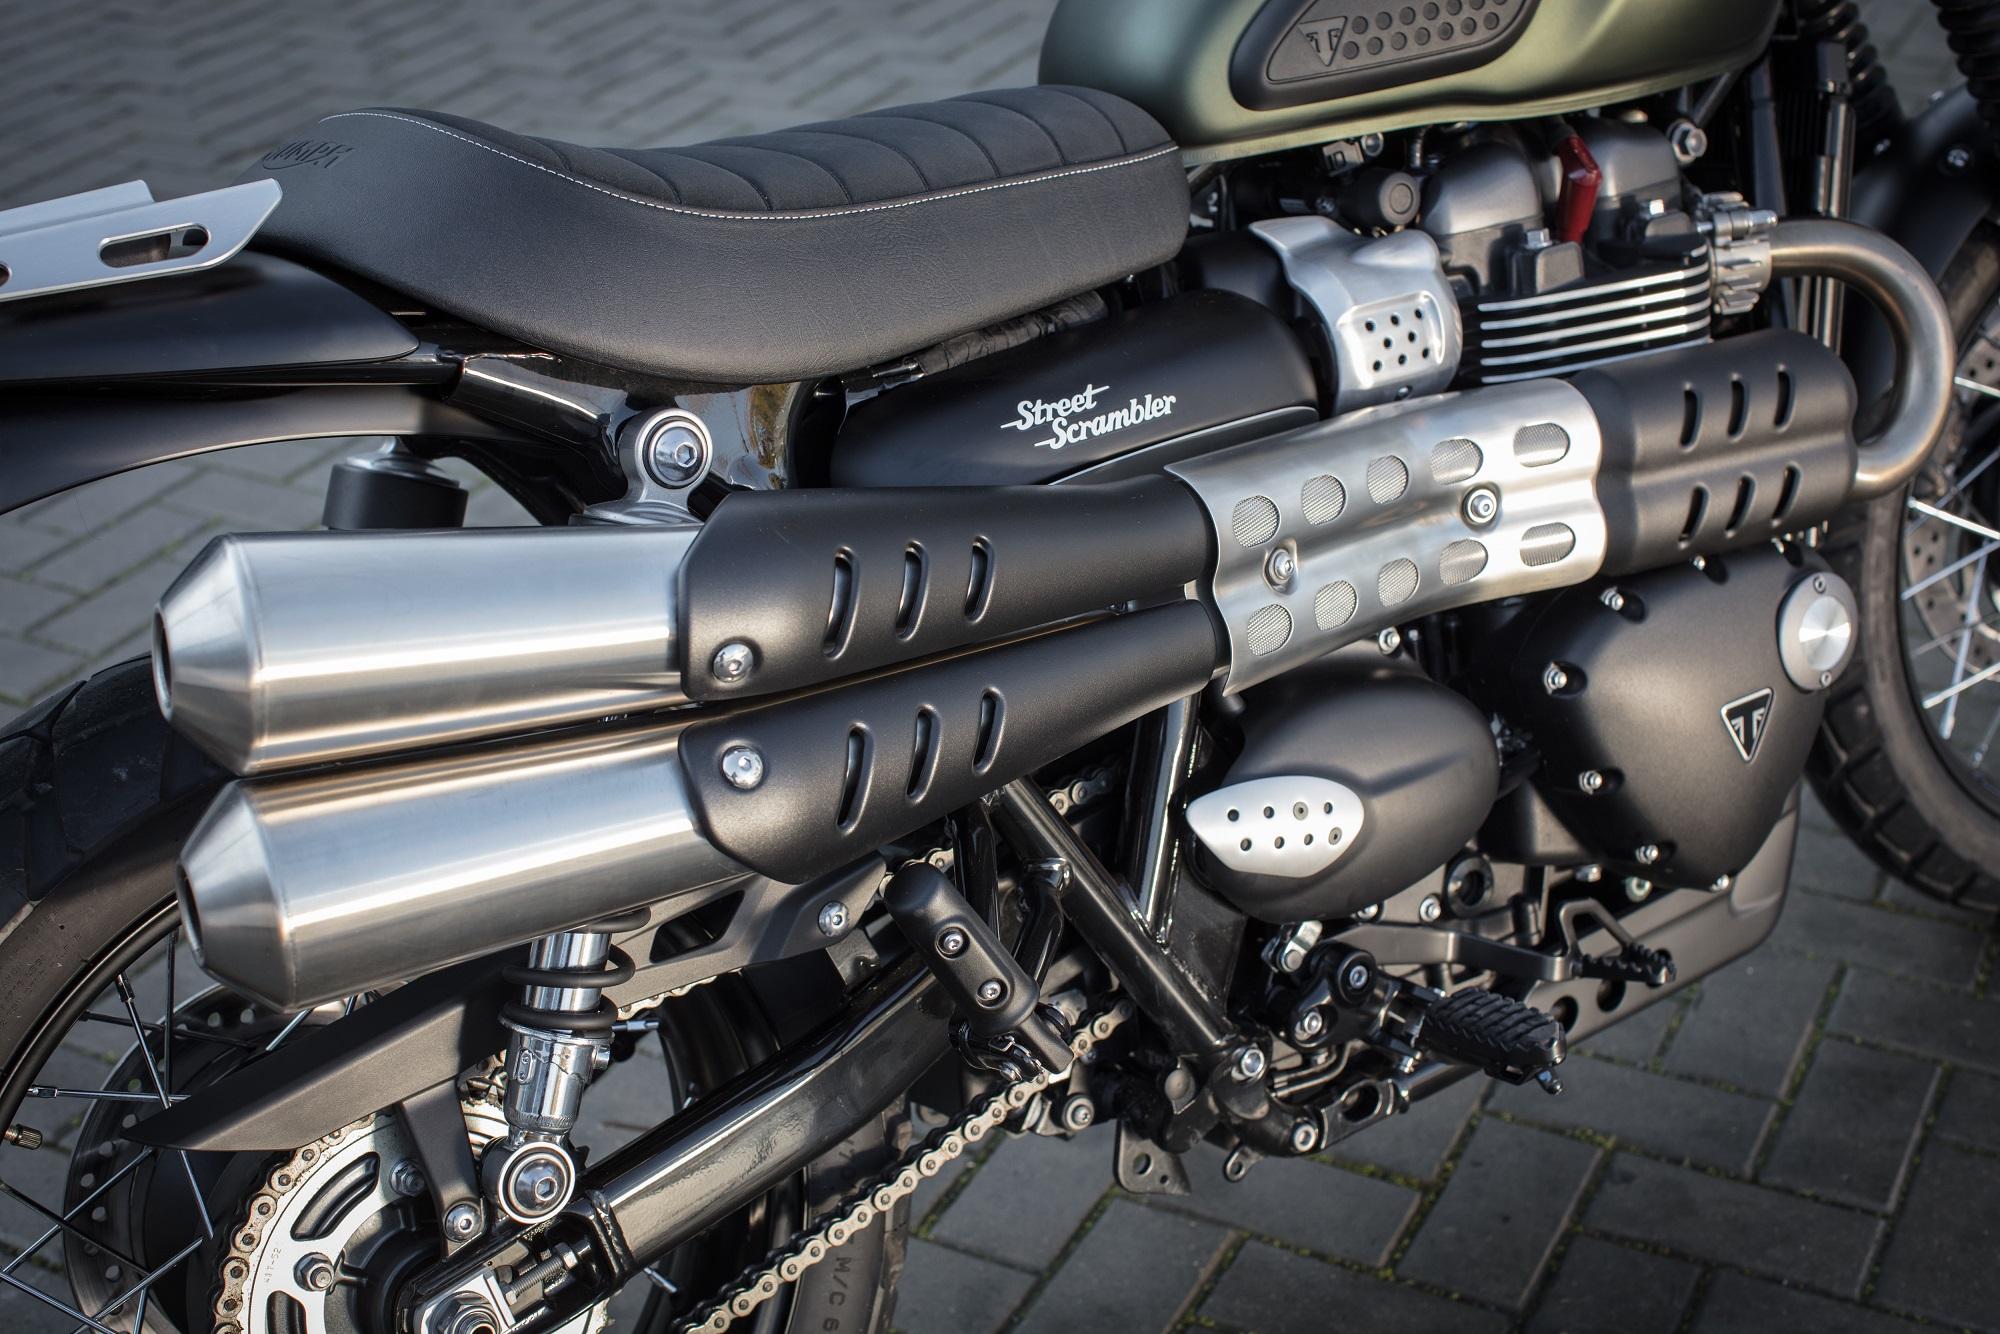 Triumph Street Scrambler engine and exhausts